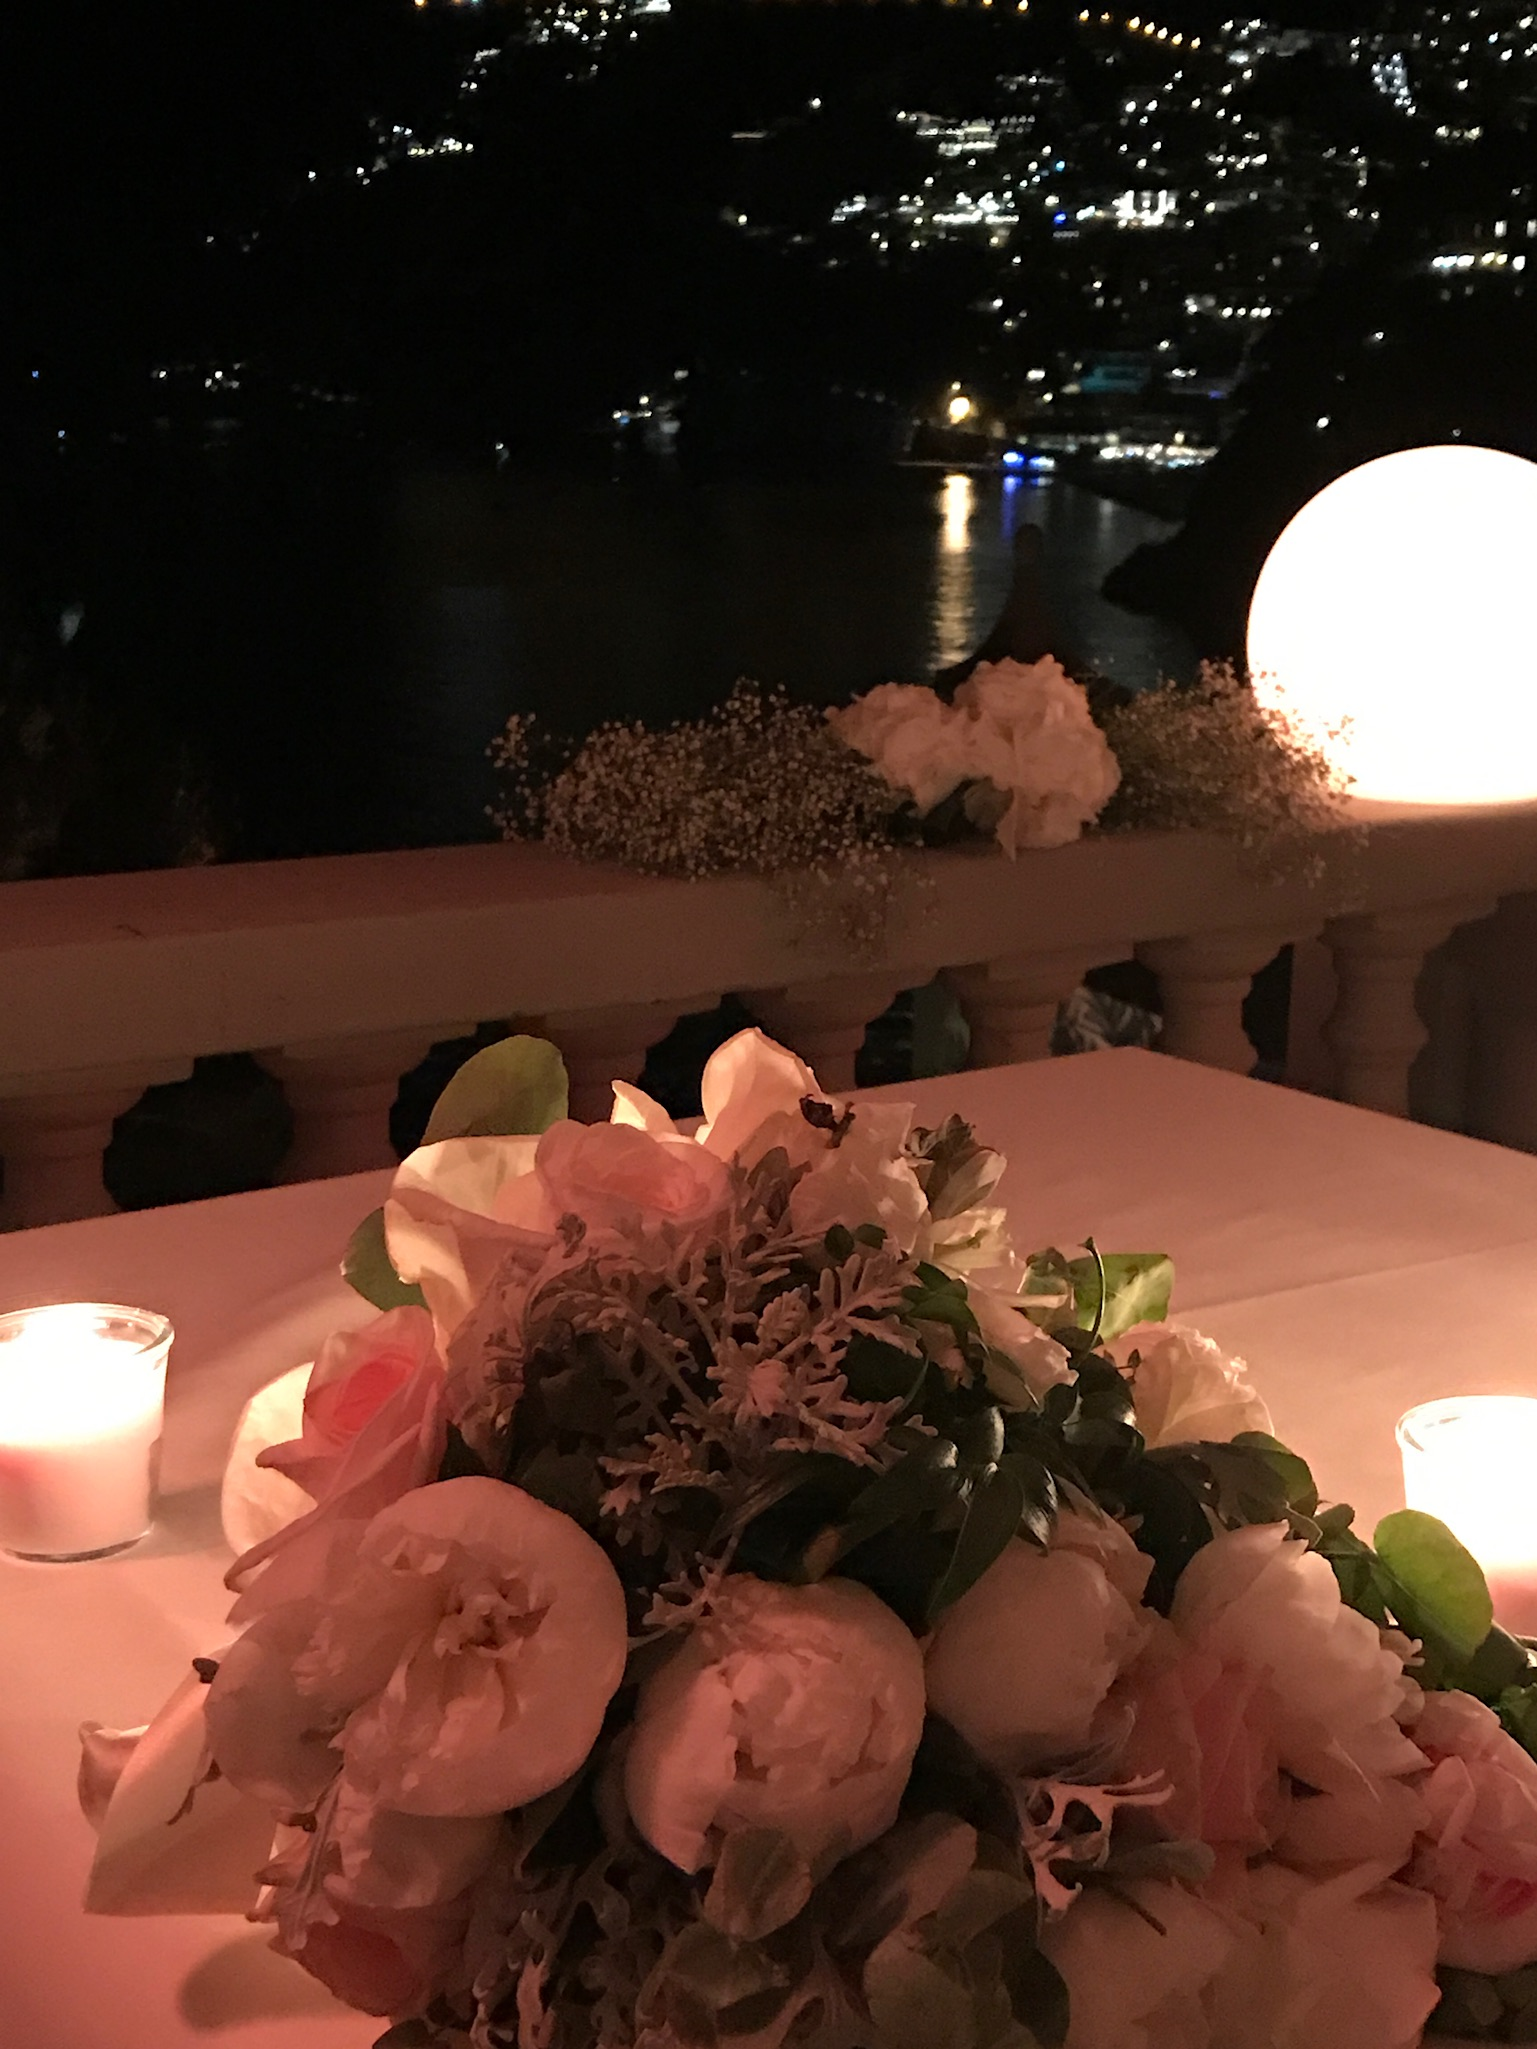 http://www.weddingamalfi.com/wp-content/uploads/Nathalie-and-Benjamin-Wedding-in-Positano-Italy-15.jpg